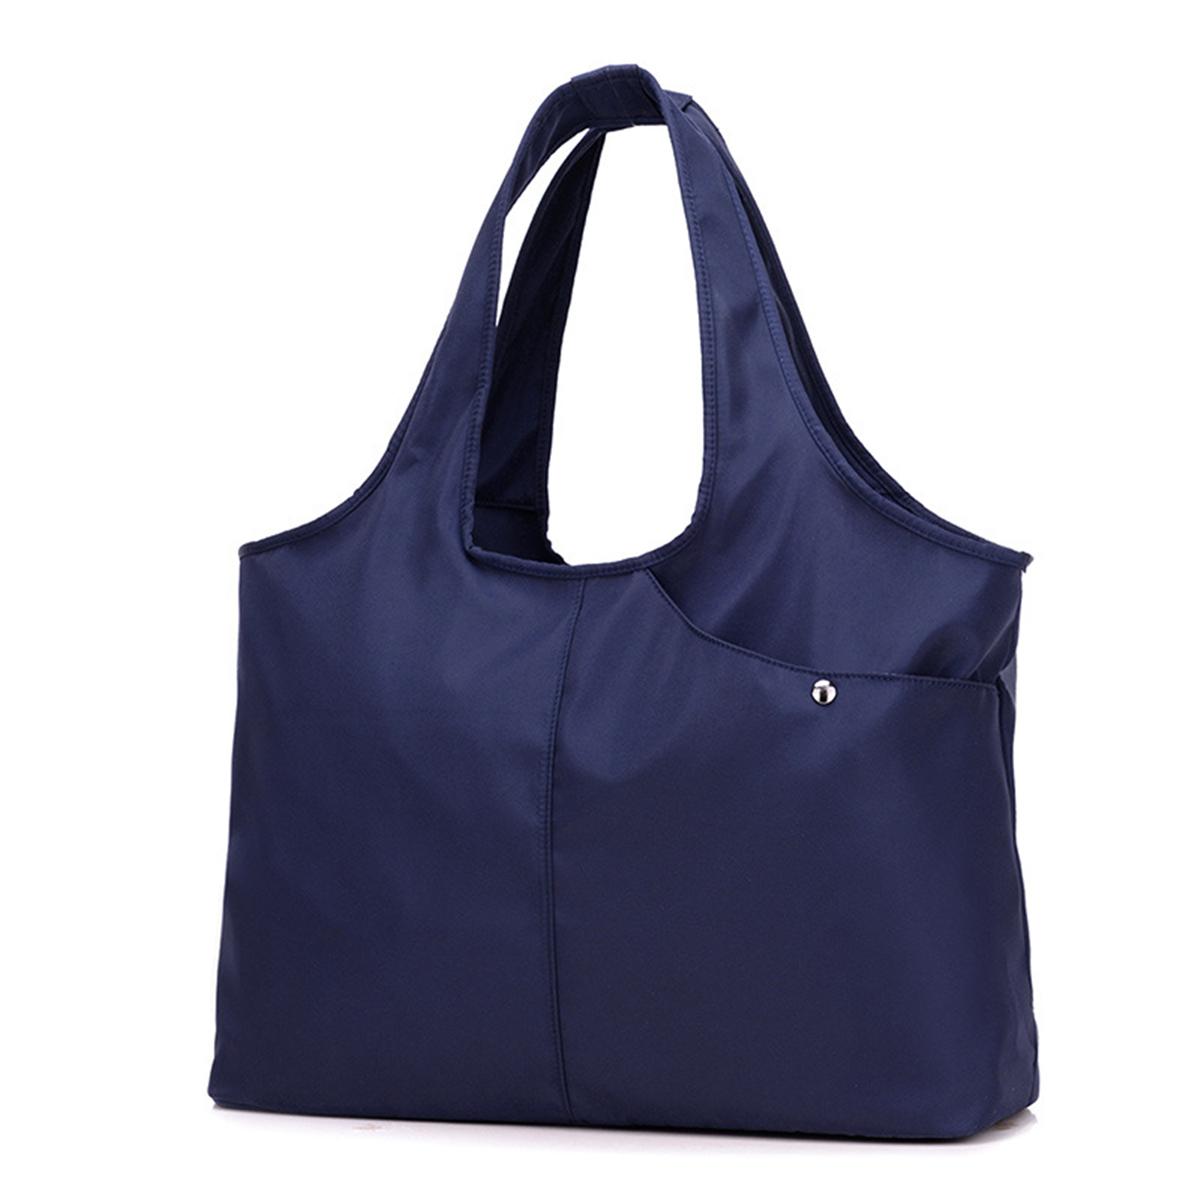 Multifunctional Waterproof Nylon Mummy Bag Large Capacity Handbag Shoulder Bag